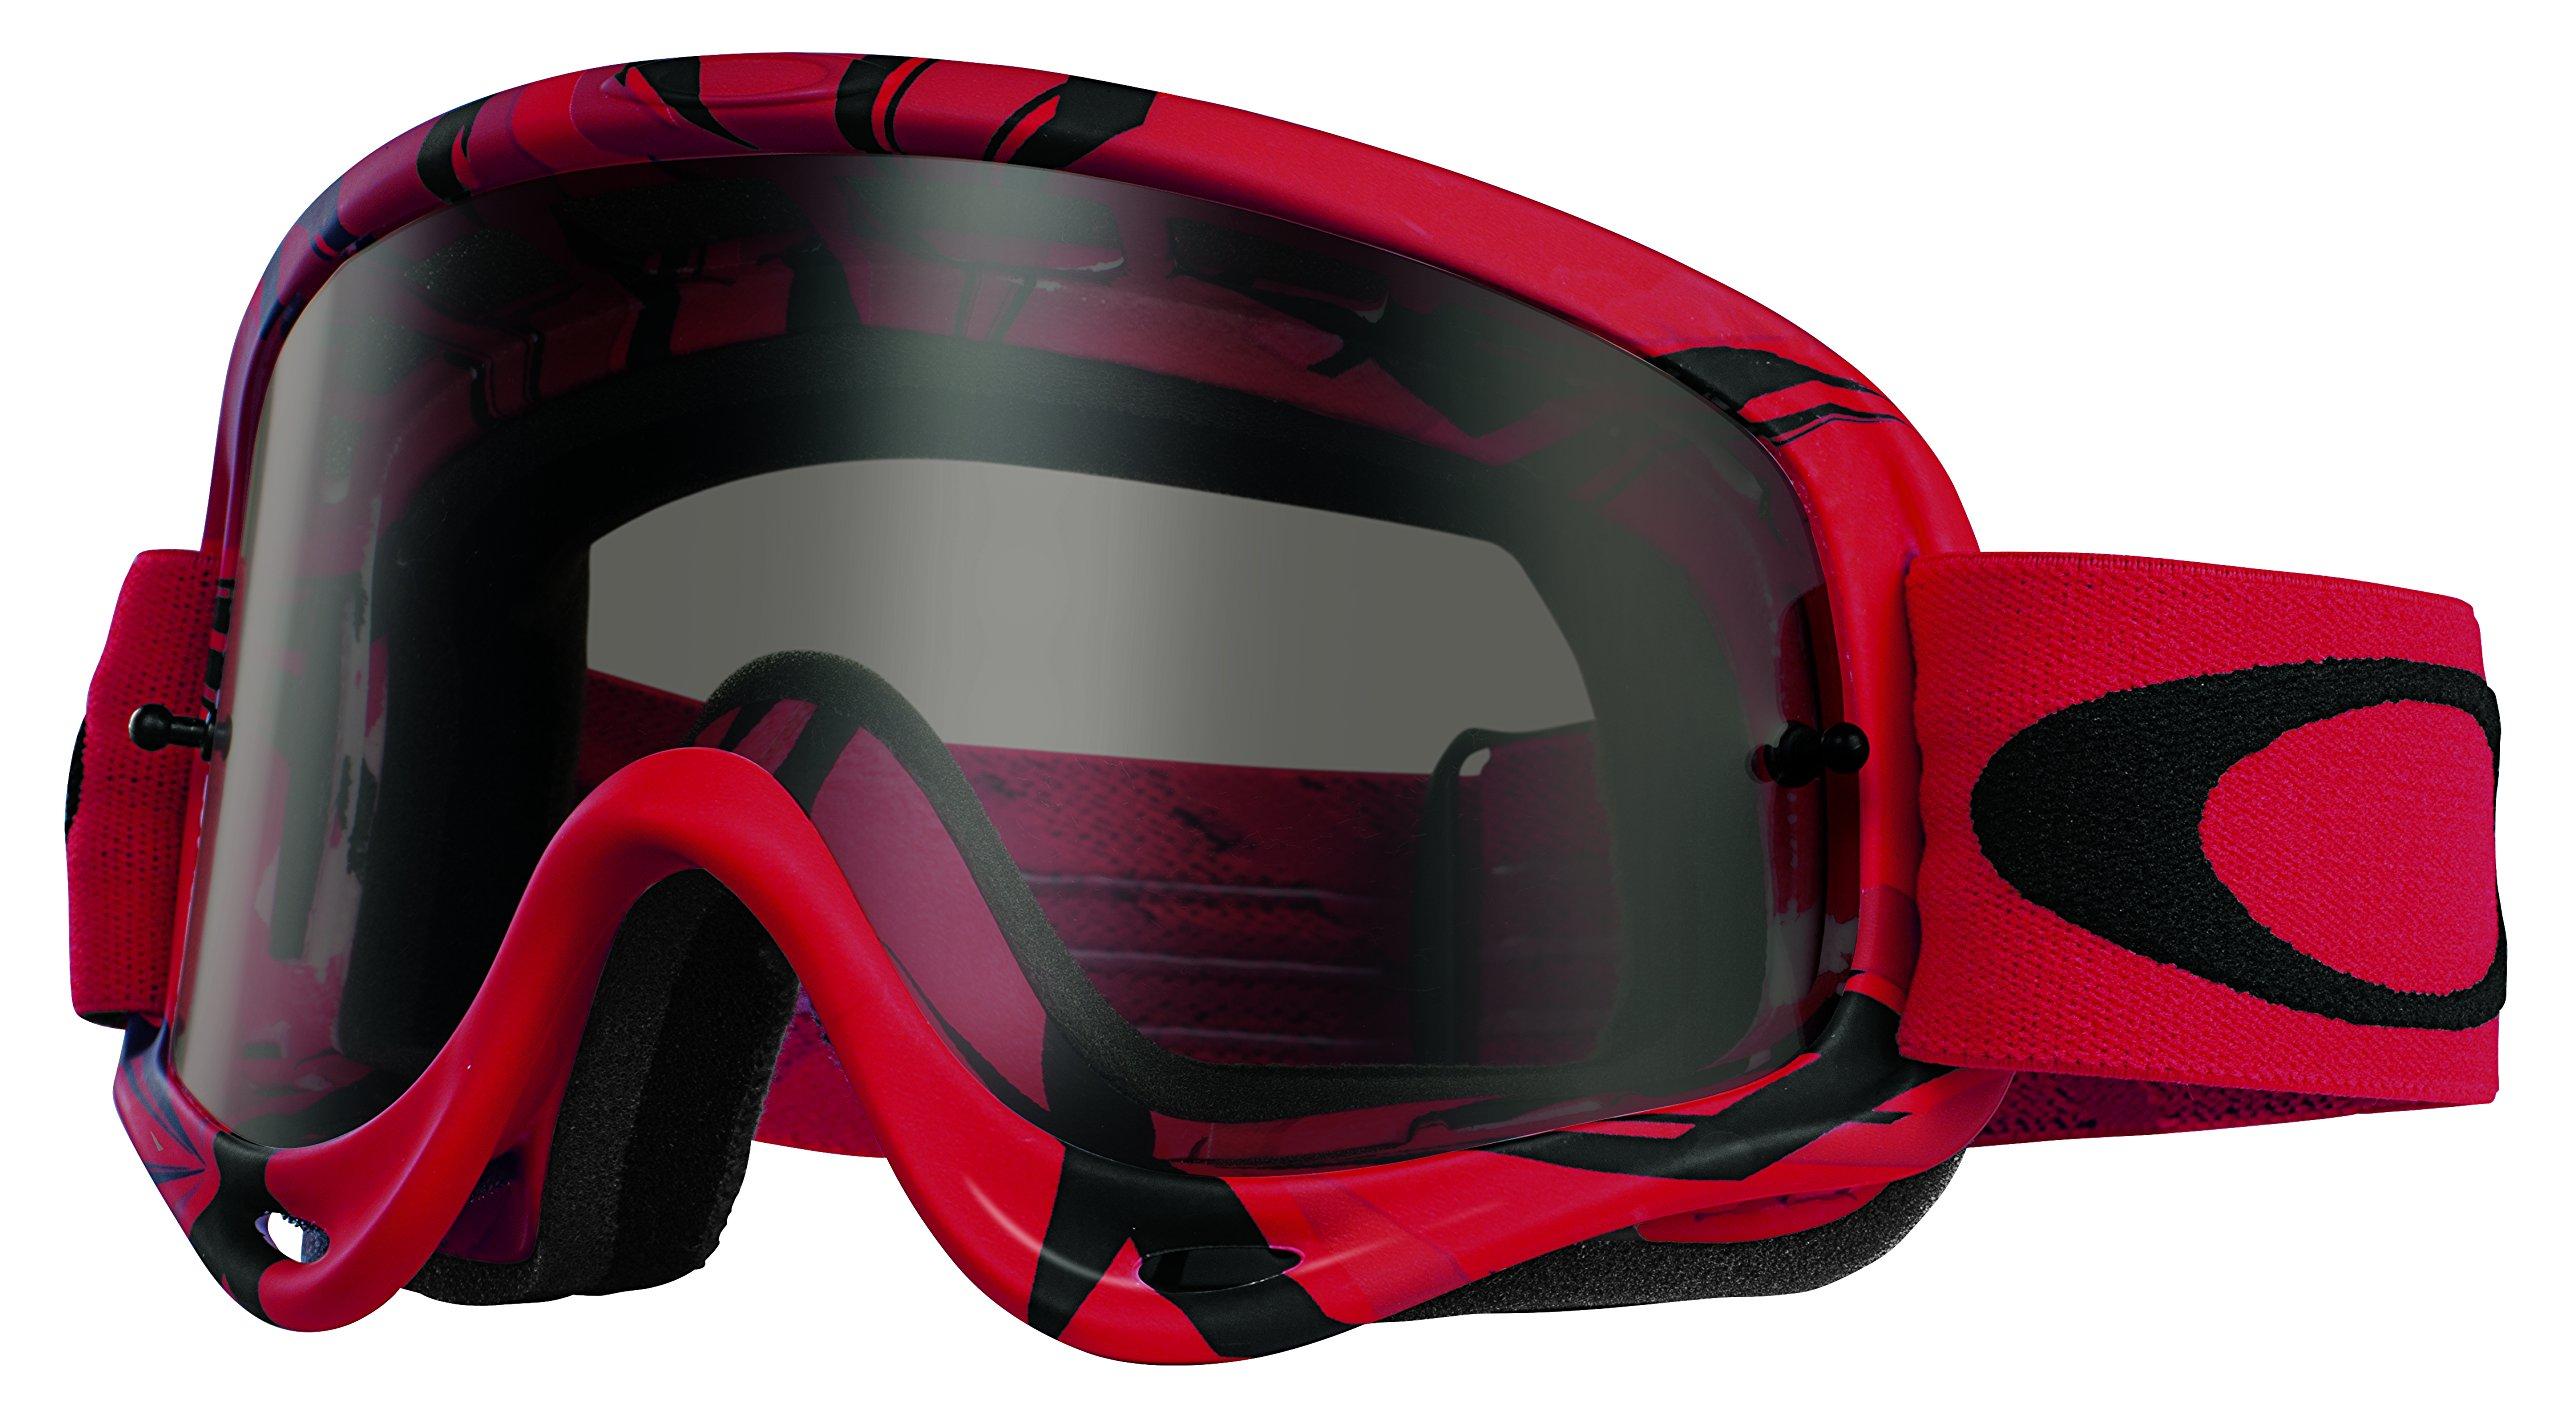 b7f5cceb85fc6 Get Quotations · Oakley O-Frame MX Intimidator Goggles (Red Black Frame Dark  Grey Lens